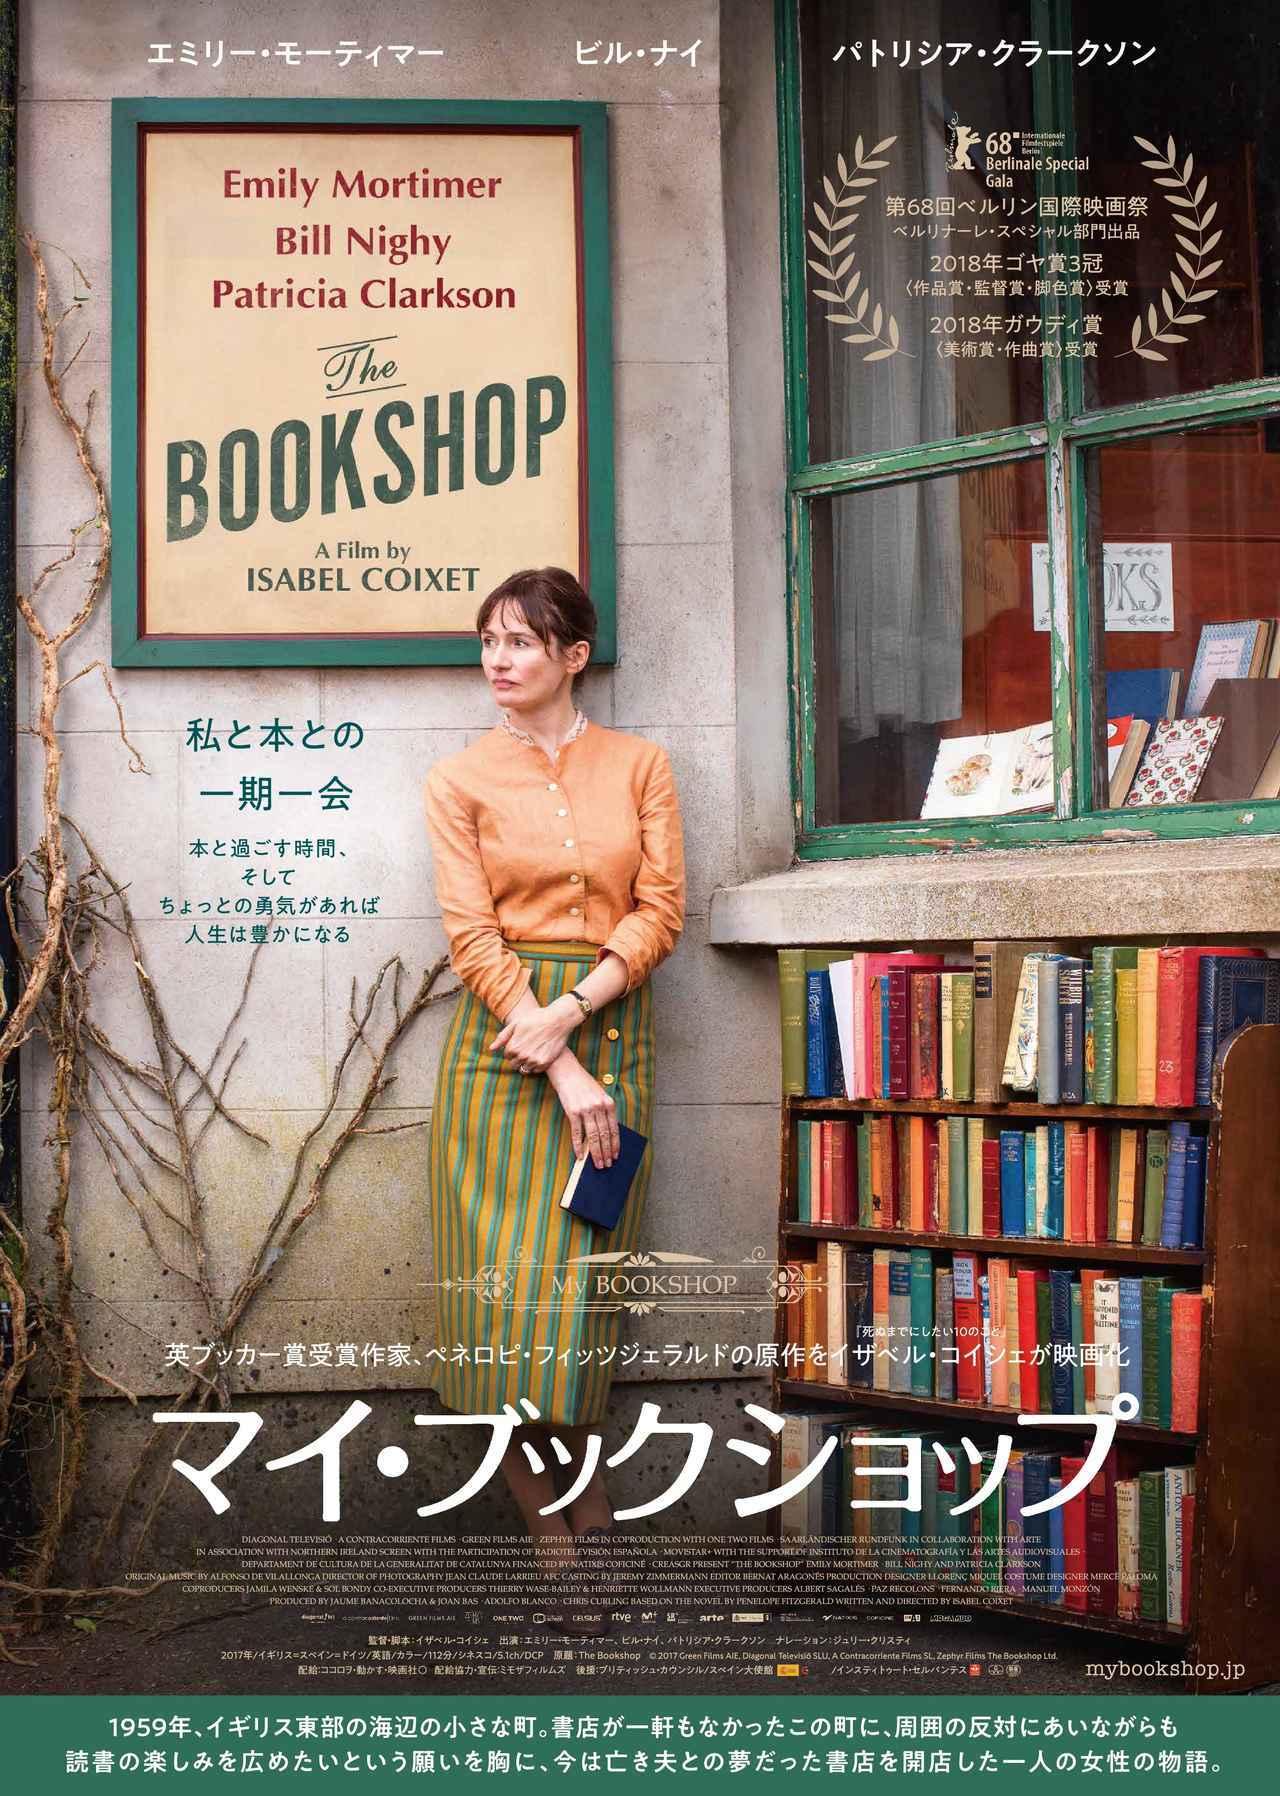 画像1: © 2017 Green Films AIE, Diagonal Televisió SLU, A Contracorriente Films SL, Zephyr Films The Bookshop Ltd.